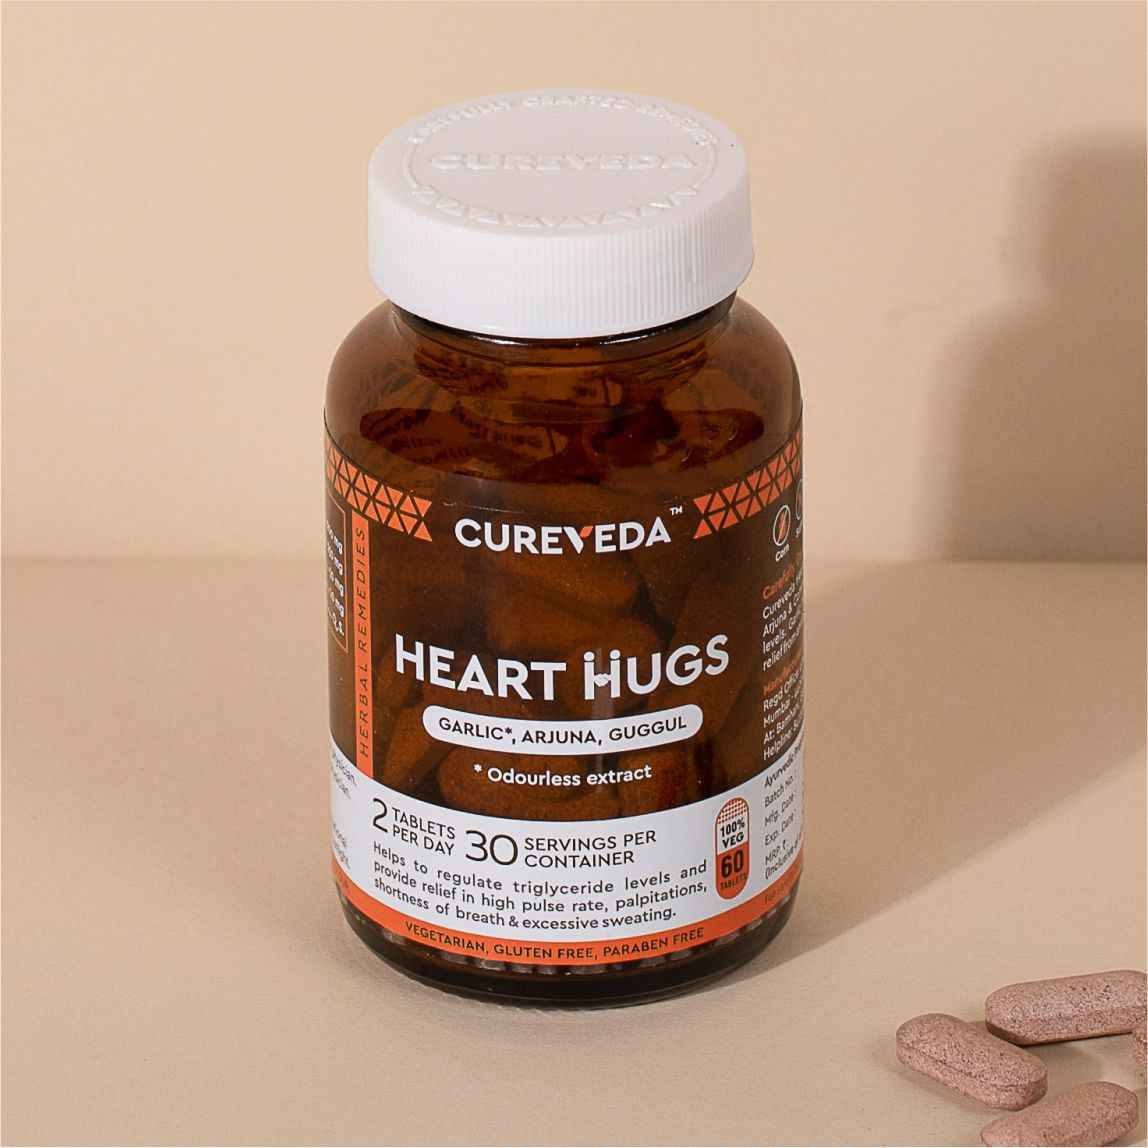 https://curevedaprod.imgix.net/h/t/httpscureveda.comwp-contentuploads202003heart-hugs-1.jpg